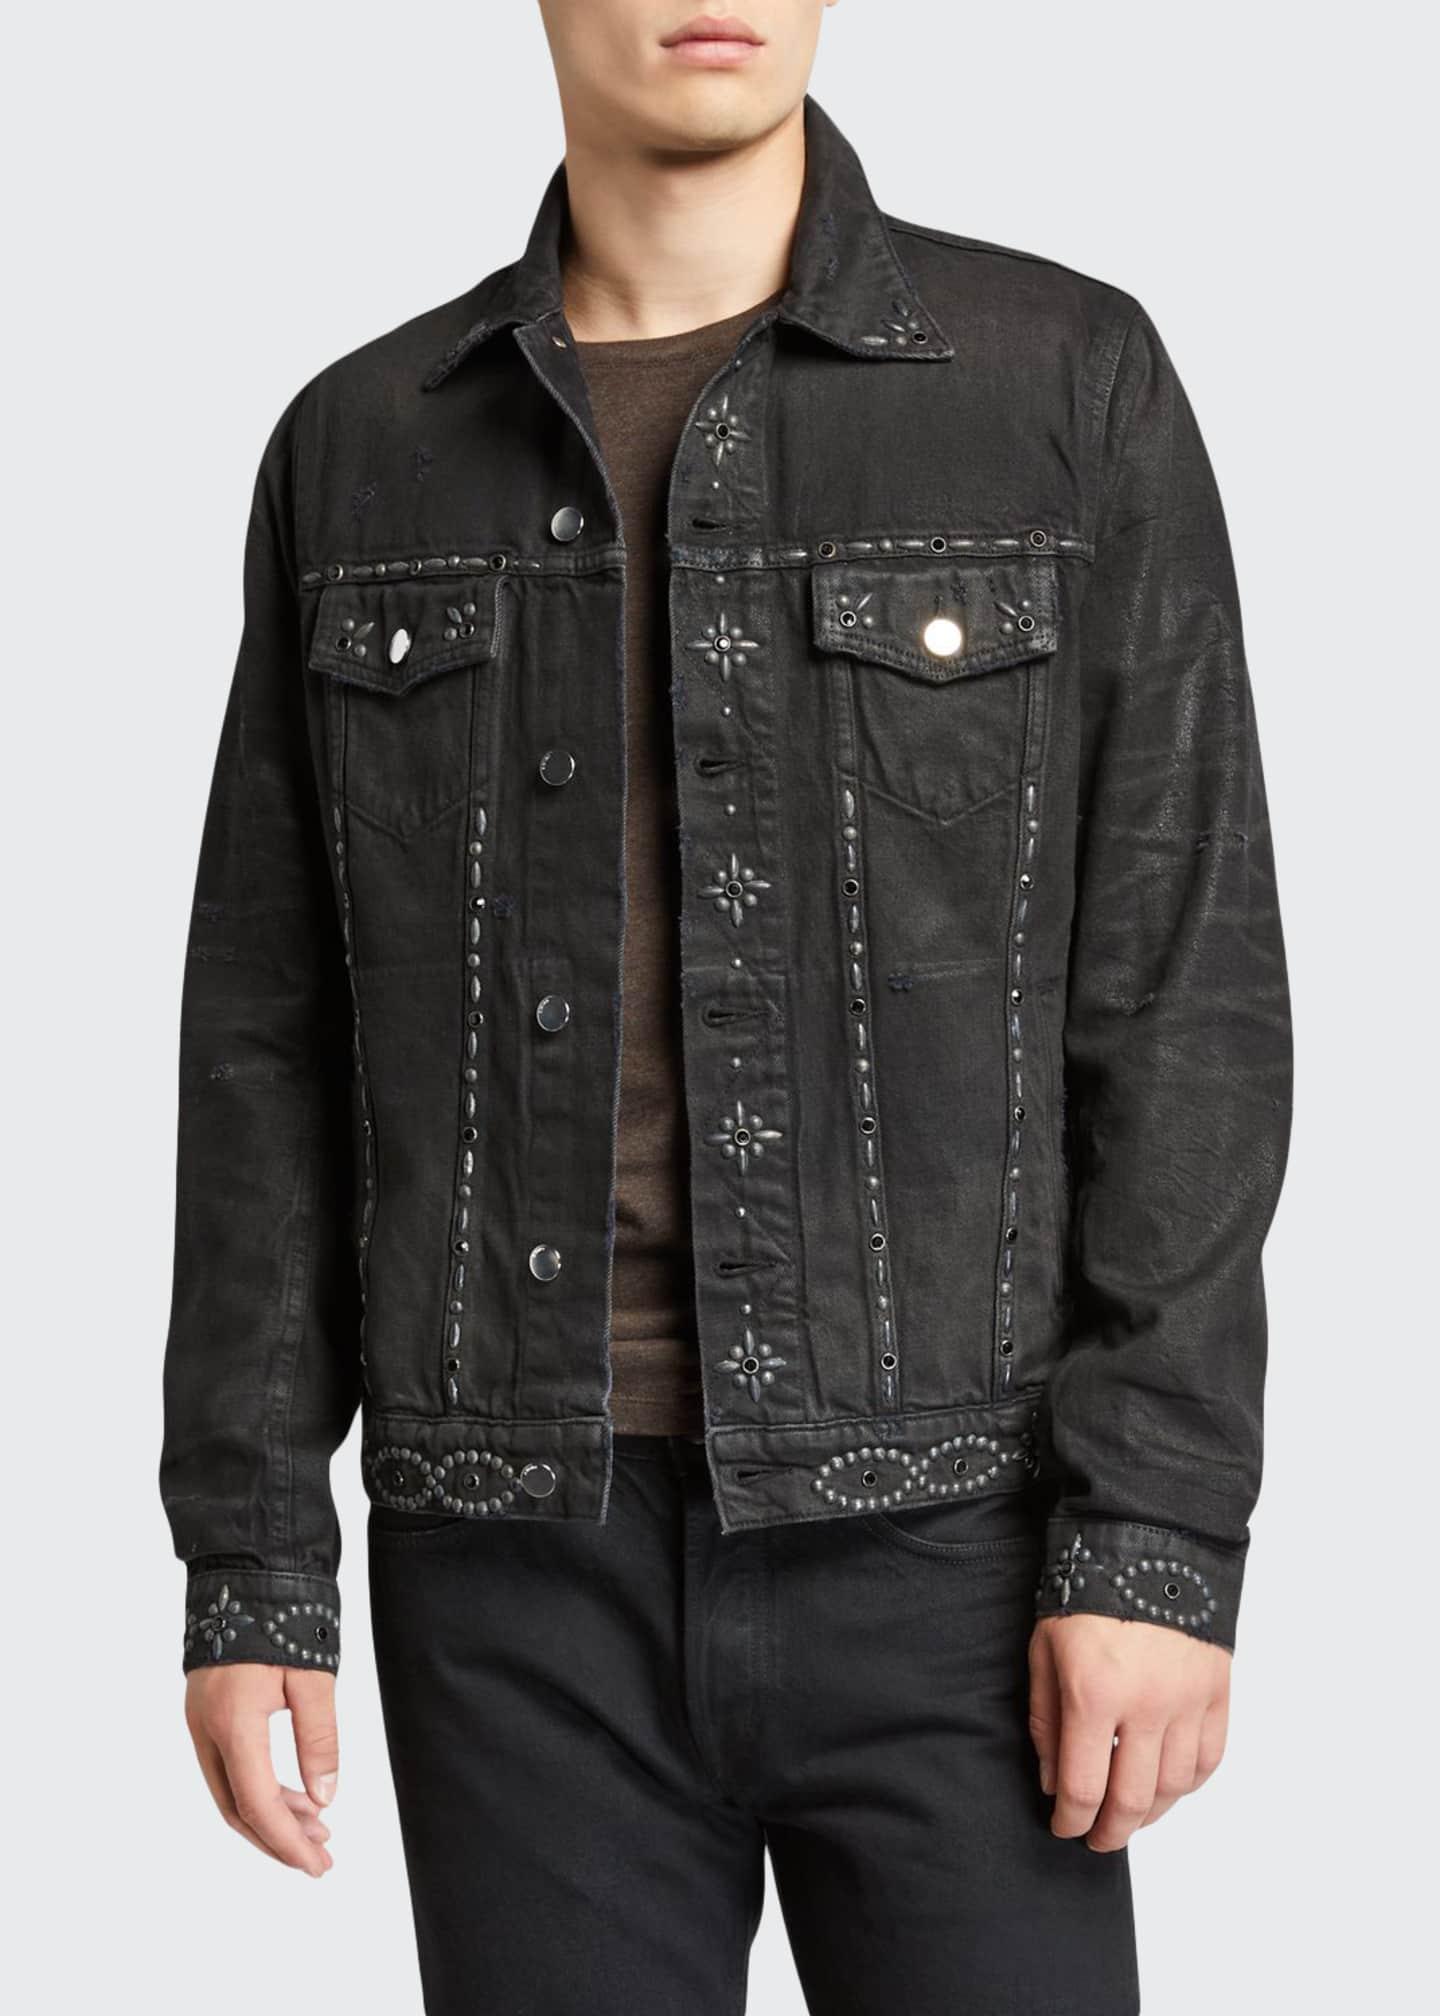 Amiri Men's Studded Denim Jacket